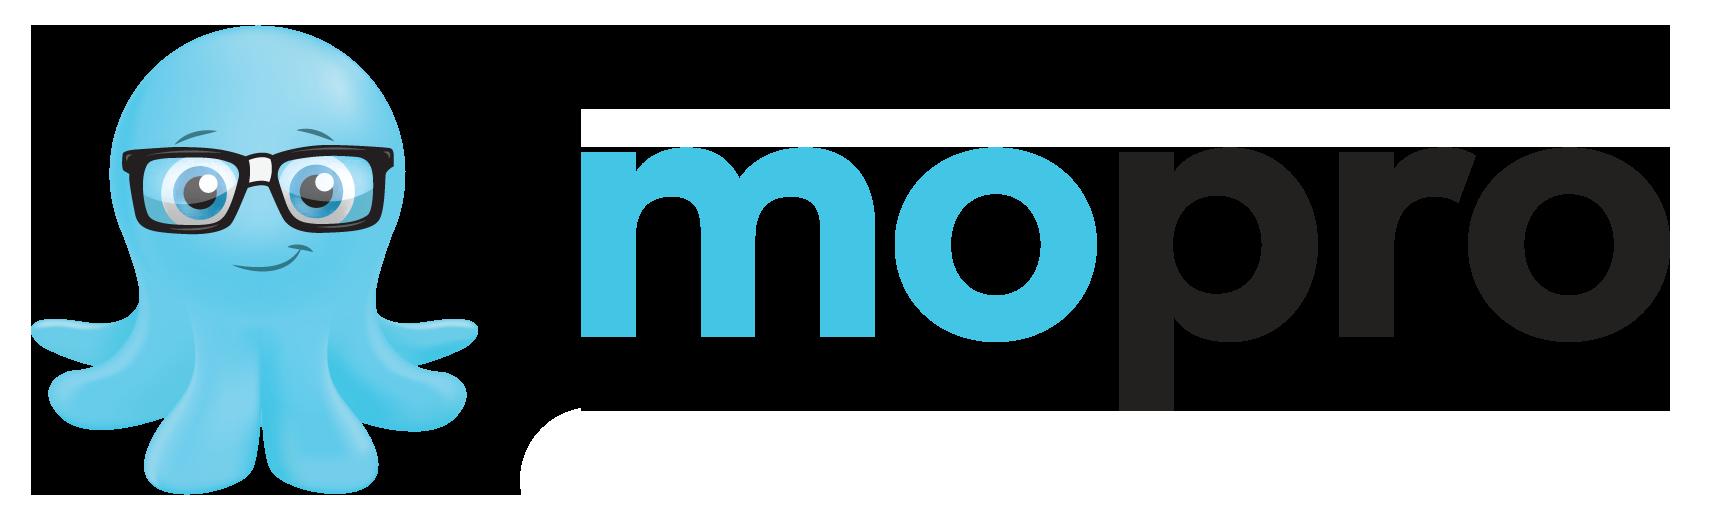 temp-post-image